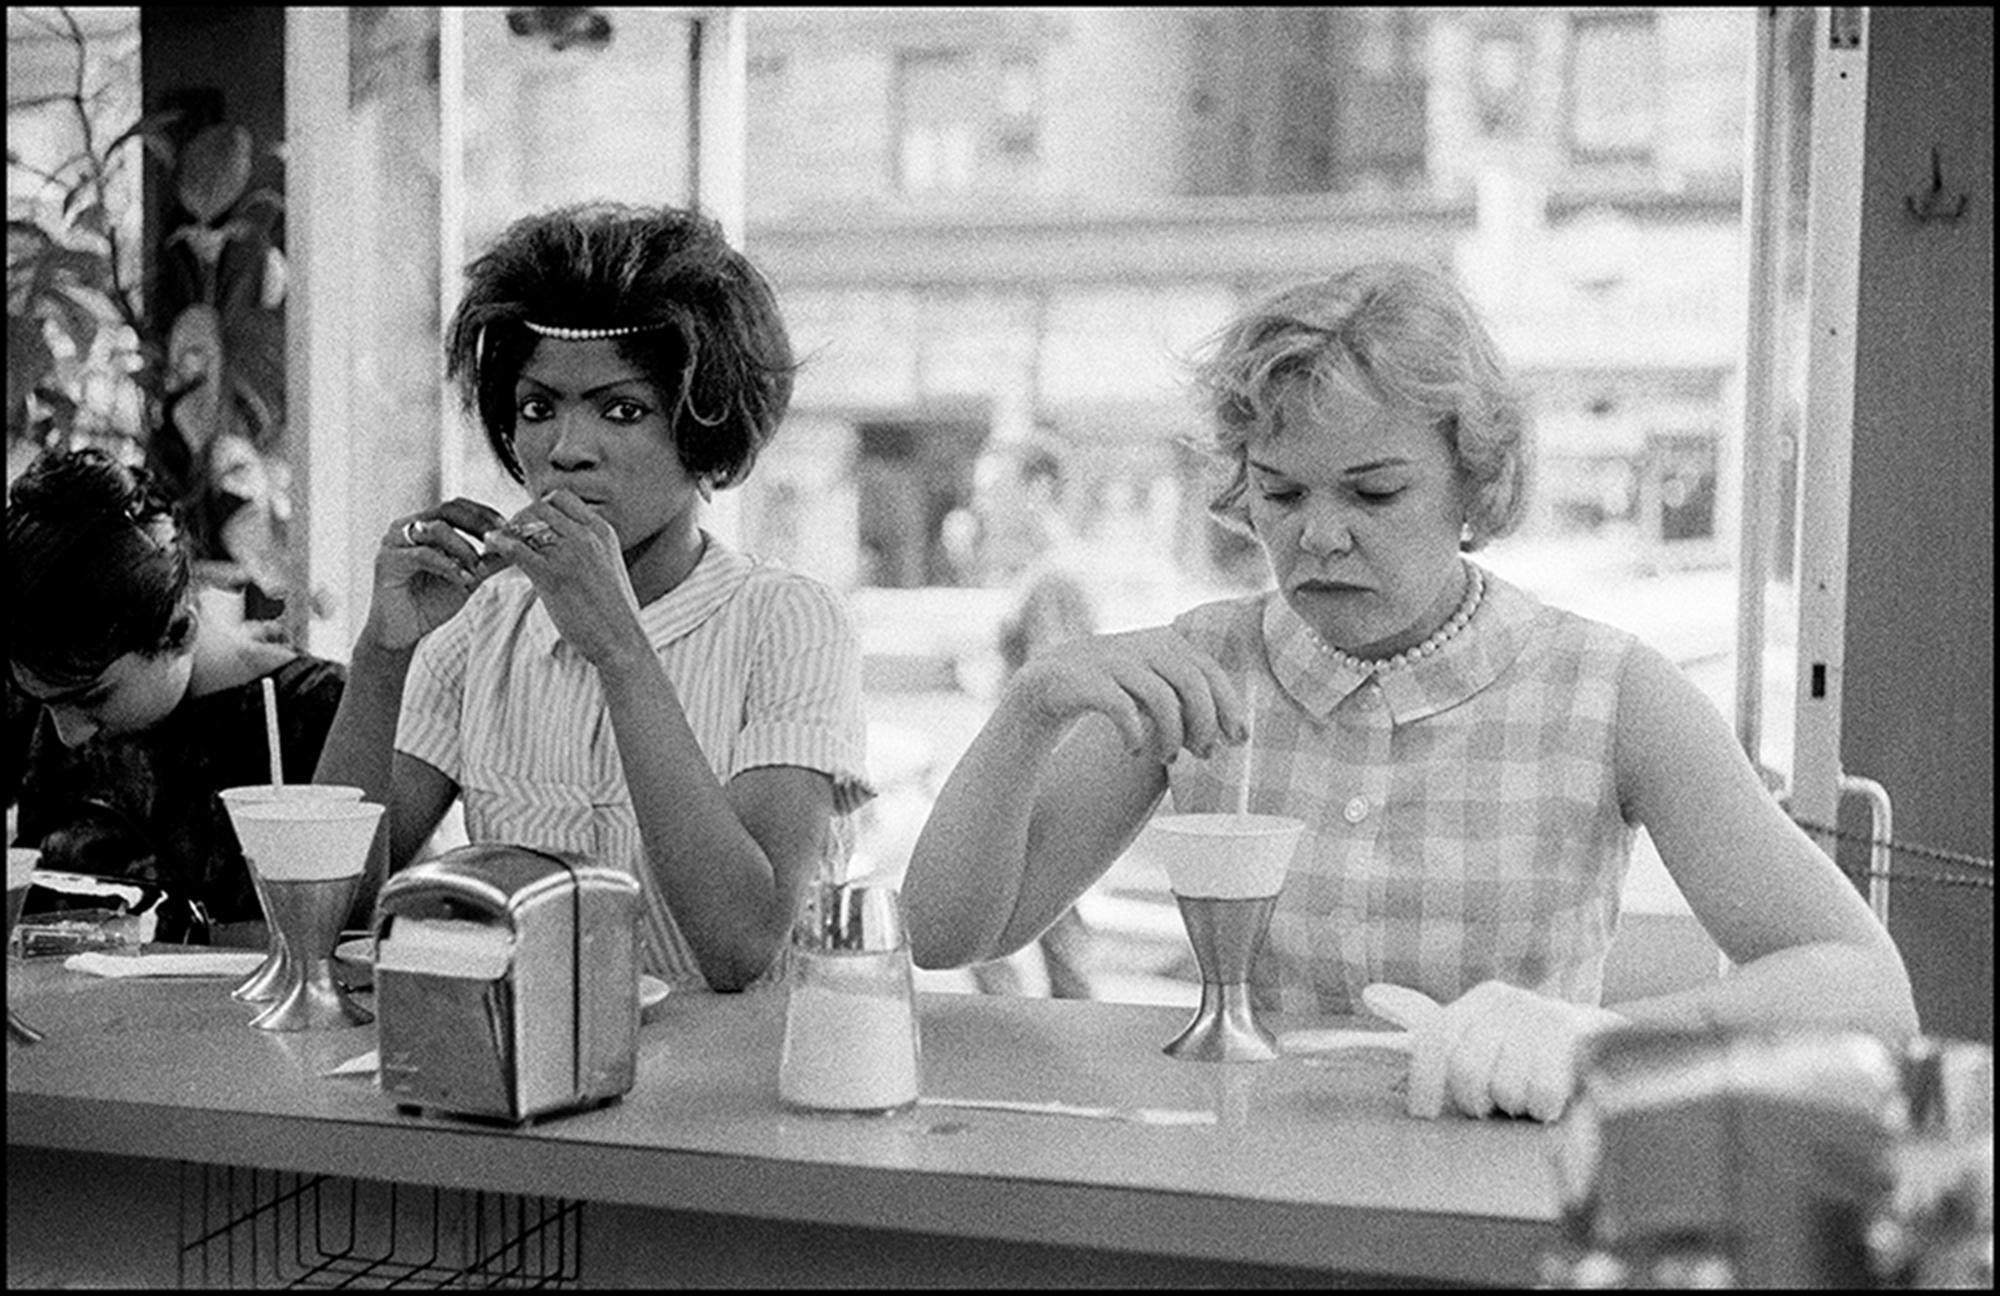 New York, 1962